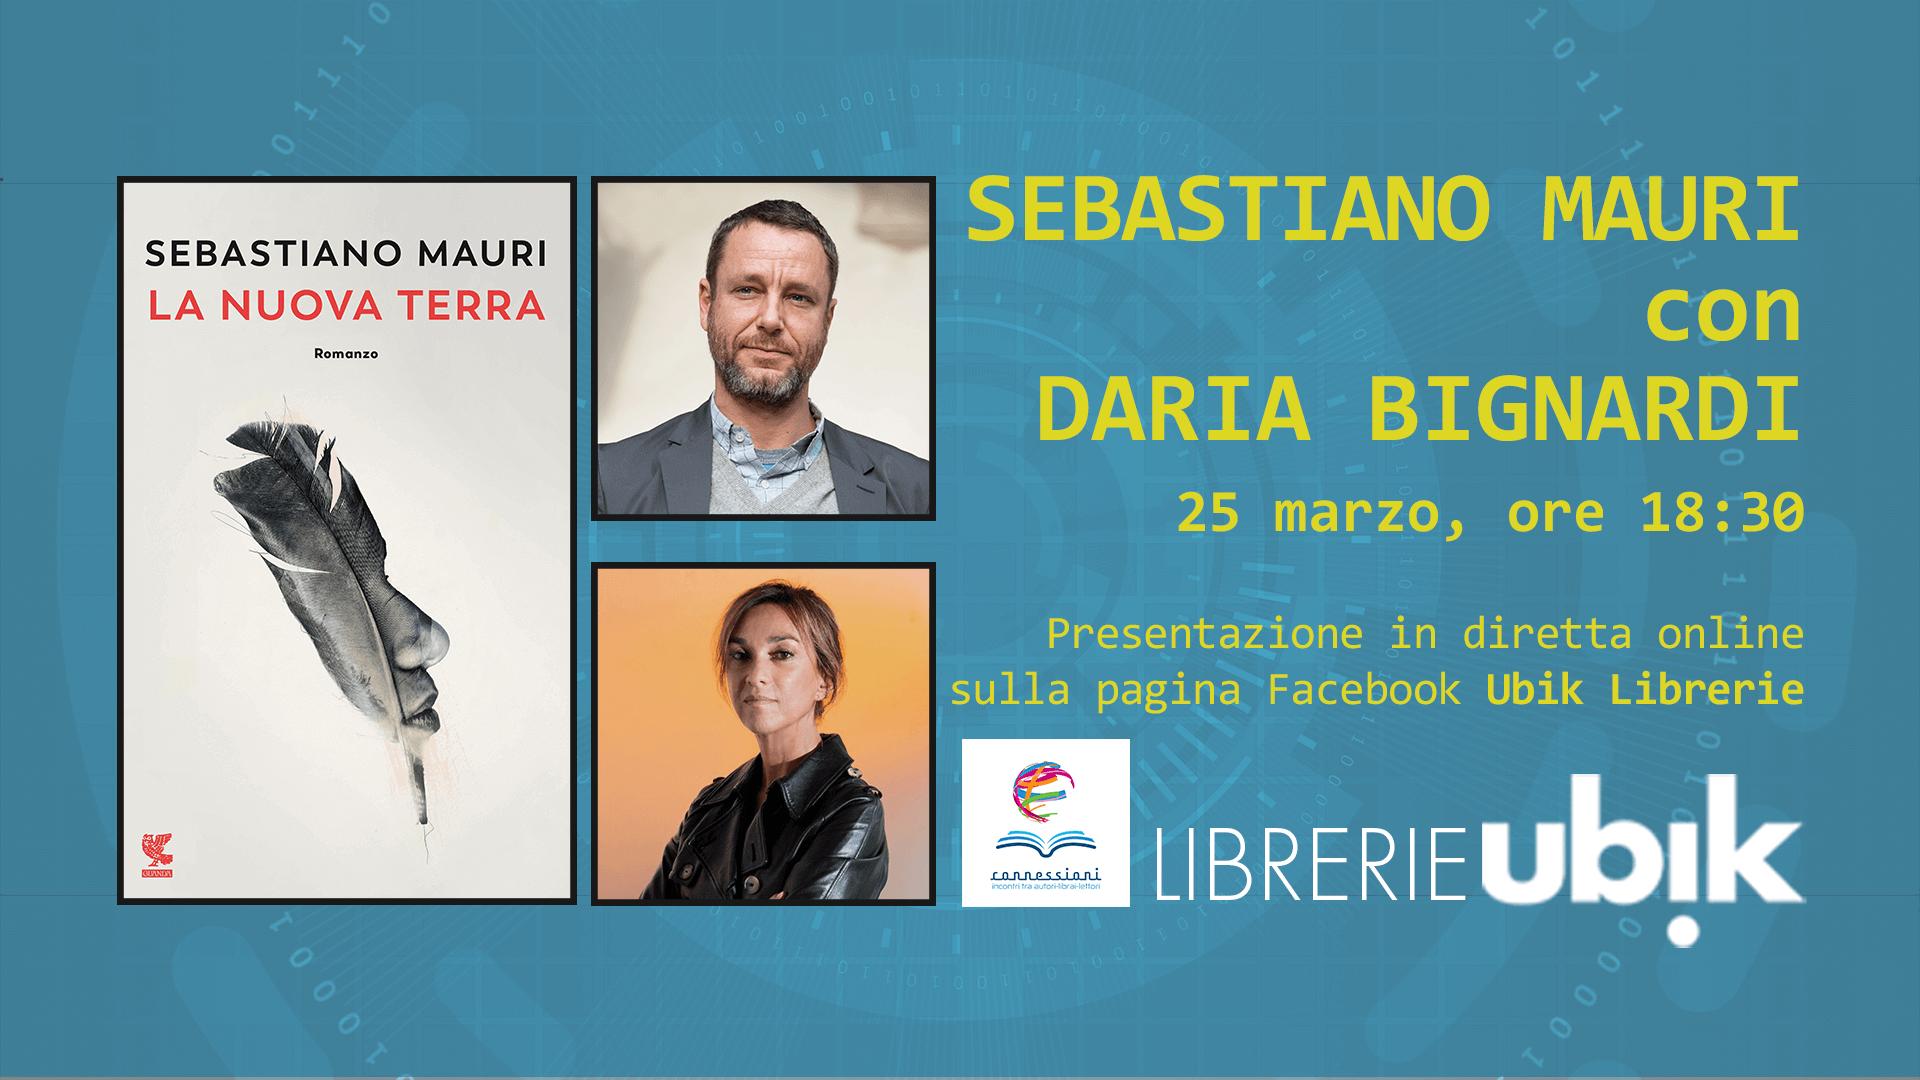 SEBASTIANO MAURI con DARIA BIGNARDI presenta in diretta online